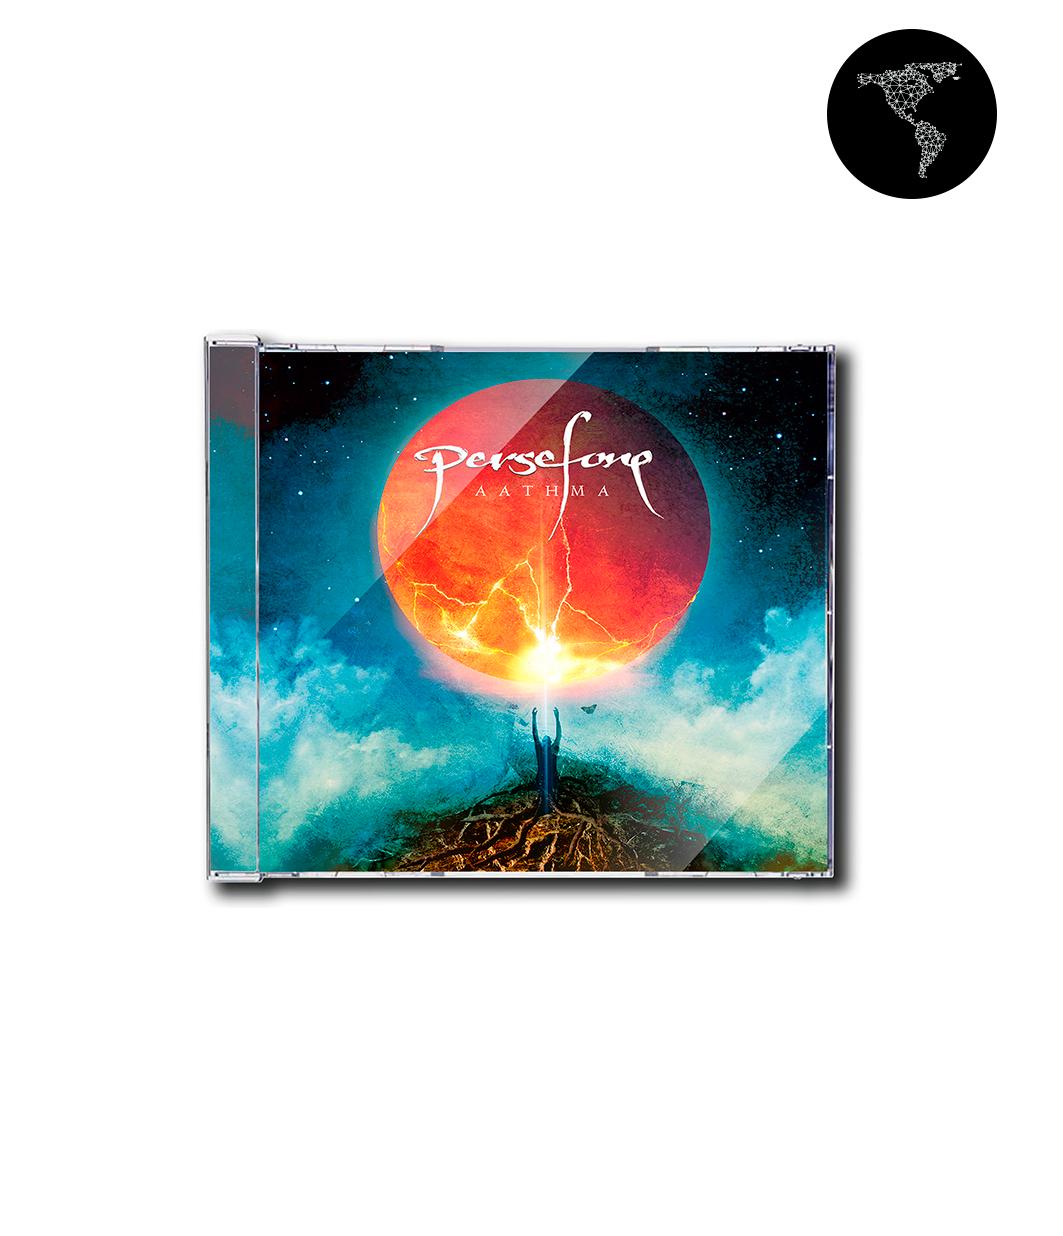 Persefone CD Aathma Music